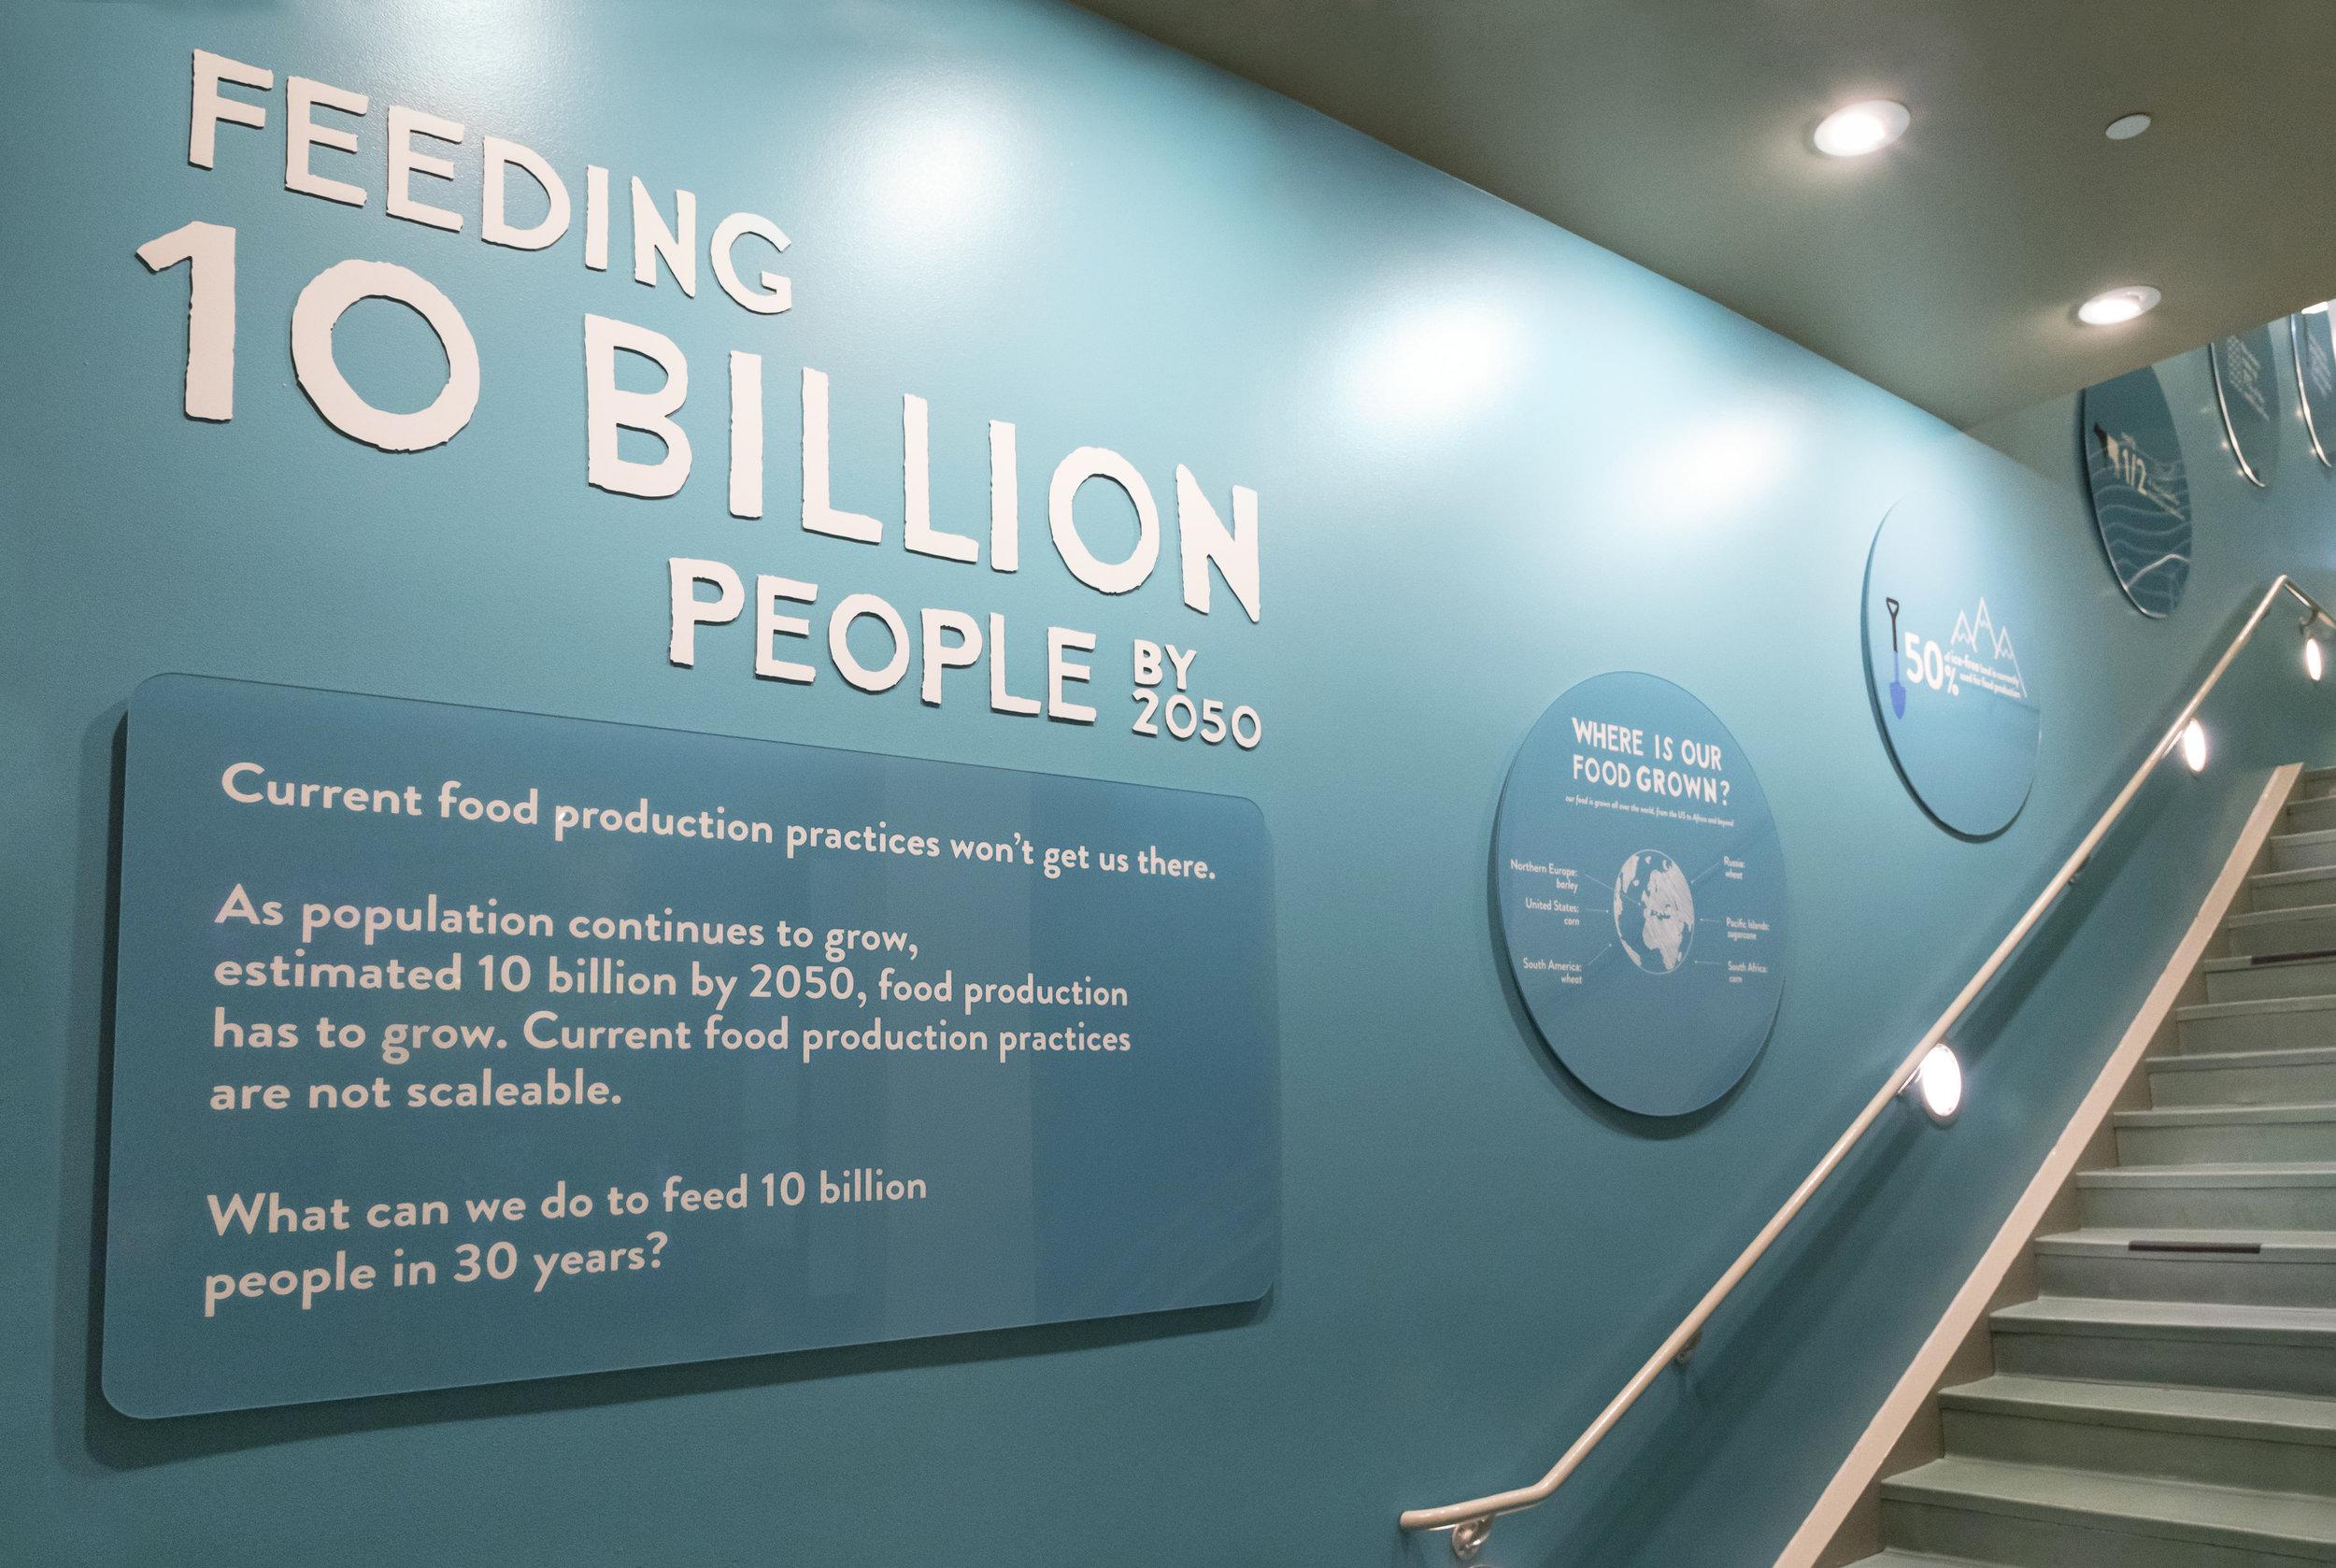 Feeding 10 Billion (at the Aquarium of the Pacific)